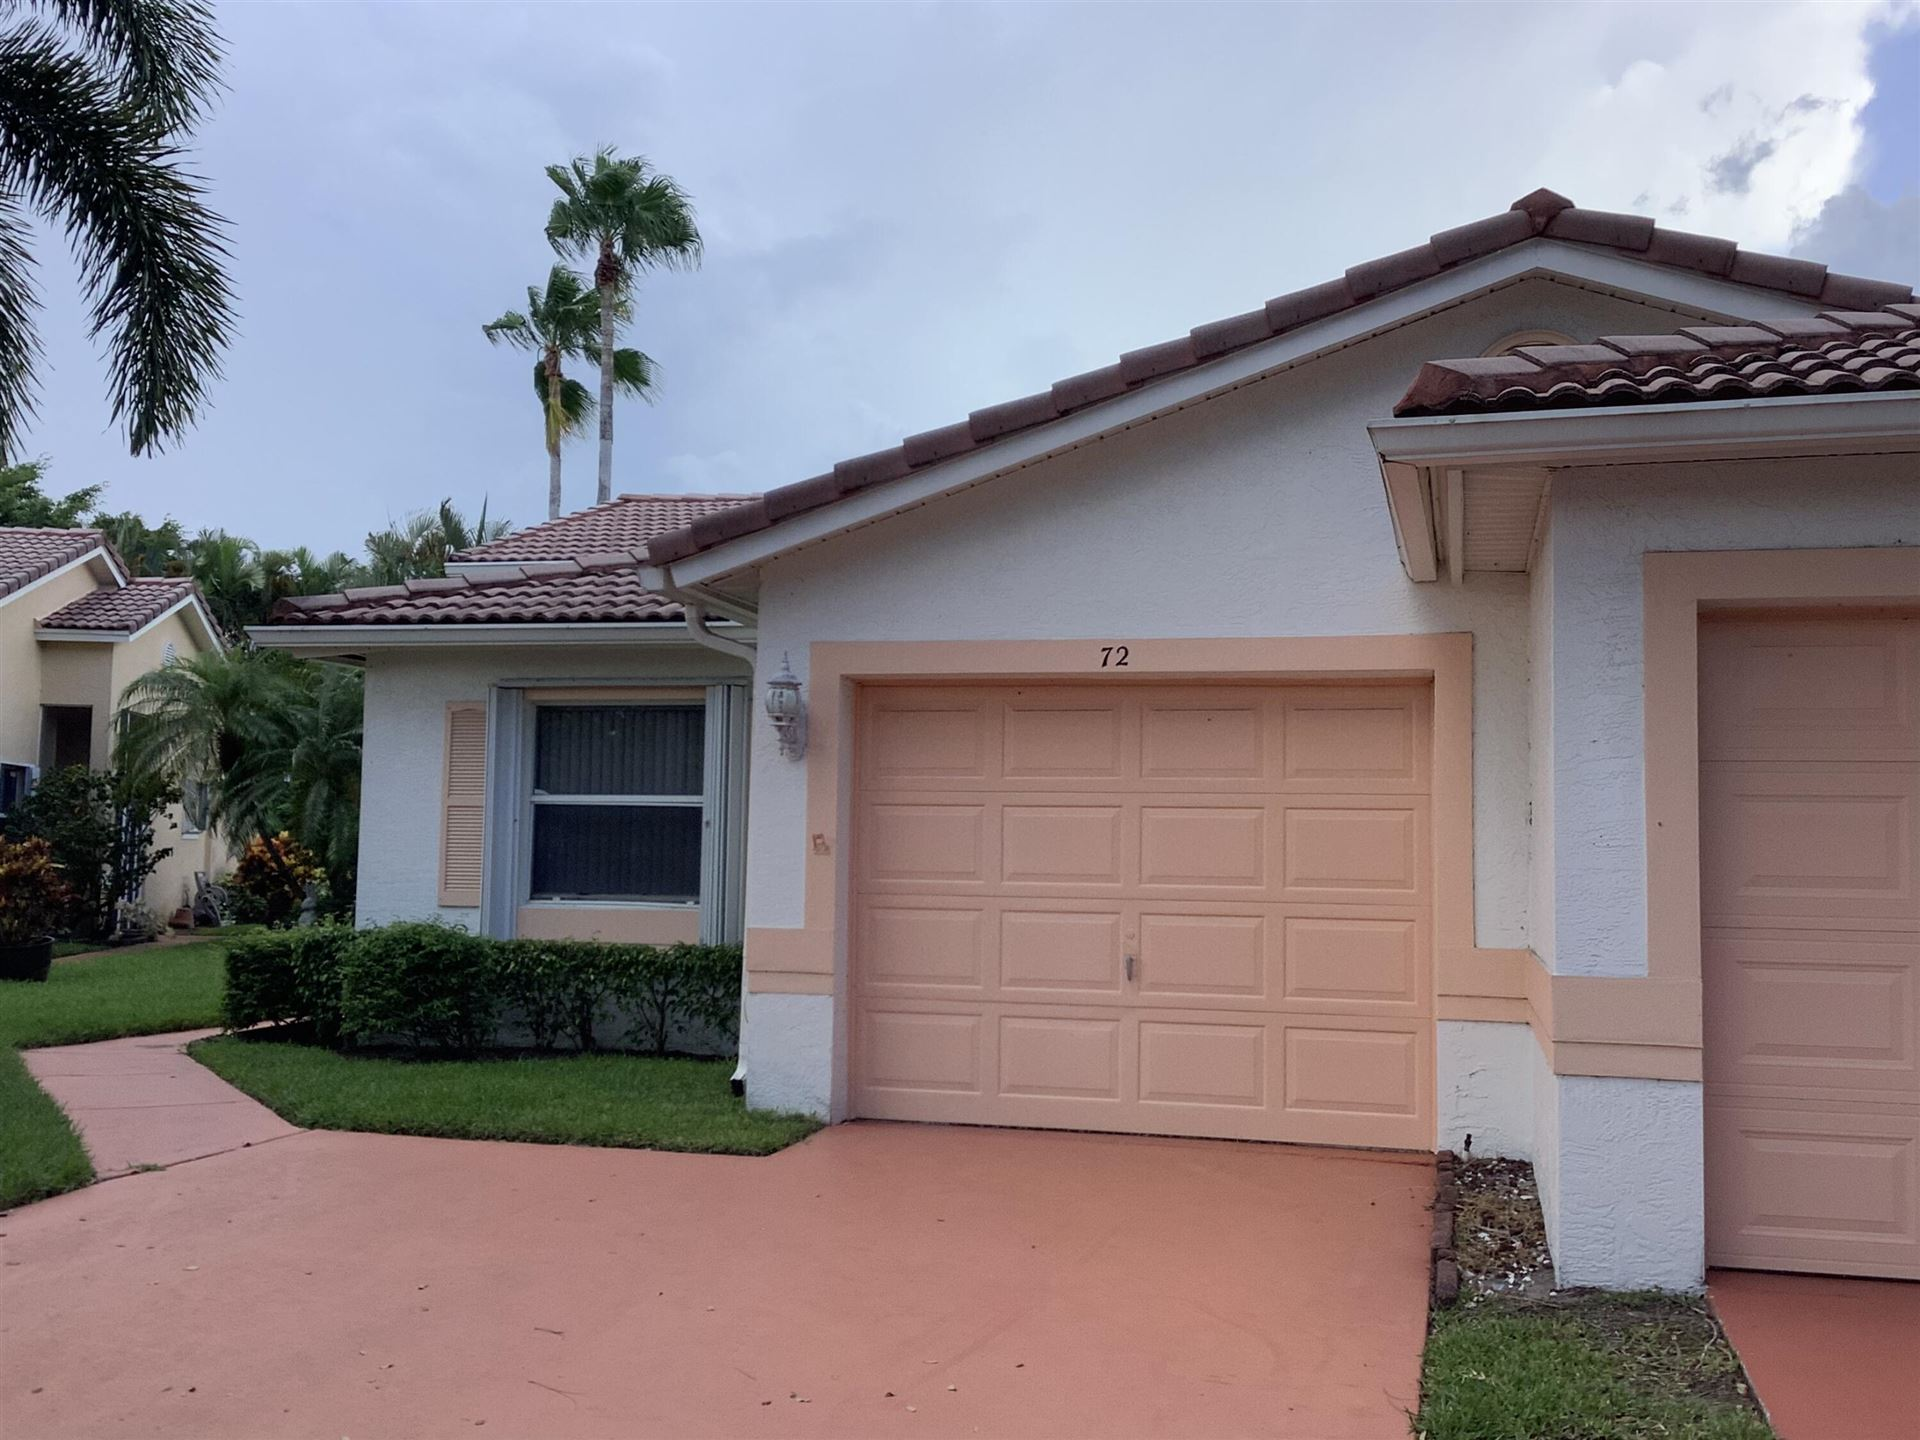 72 Sausalito Drive, Boynton Beach, FL 33436 - #: RX-10746845